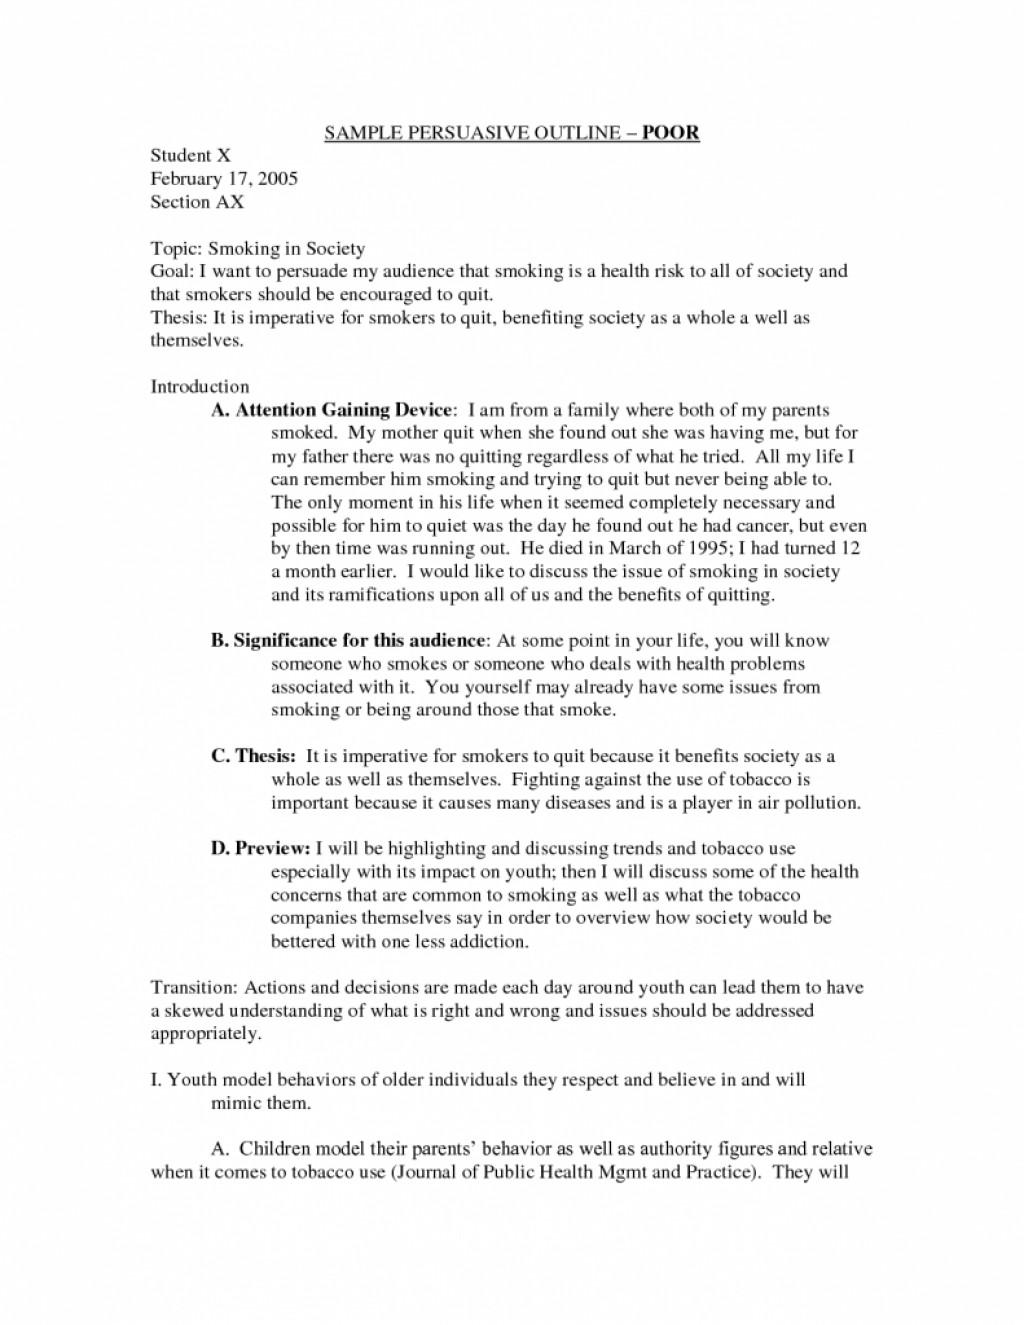 004 Middle School Persuasive Essays Poemsrom Co Animal Rights Outline Sample High Gse Bookbinder Argumentative This I Believe Impressive Essay Large